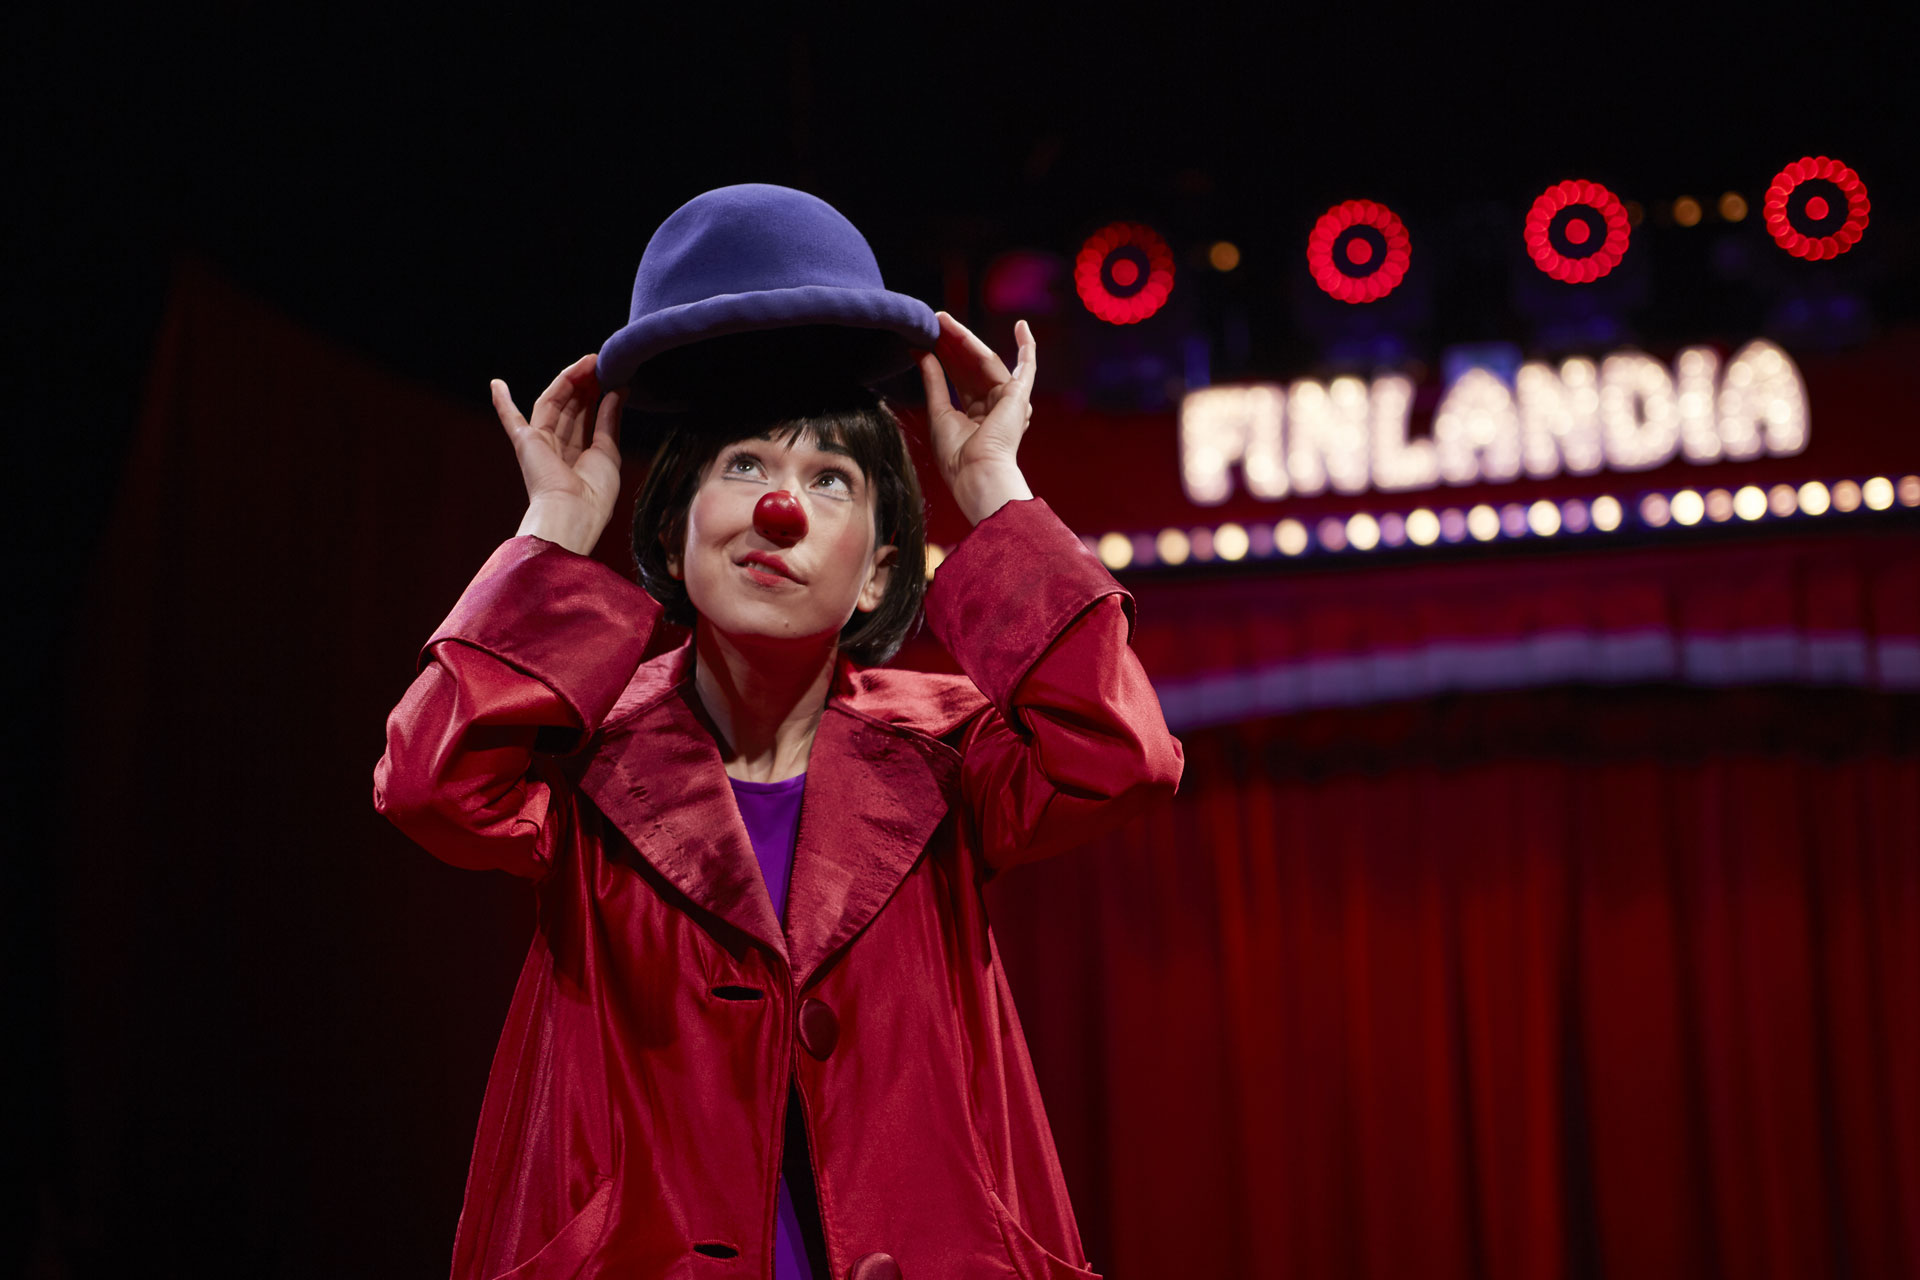 Link to event Sirkus Finlandia 2019